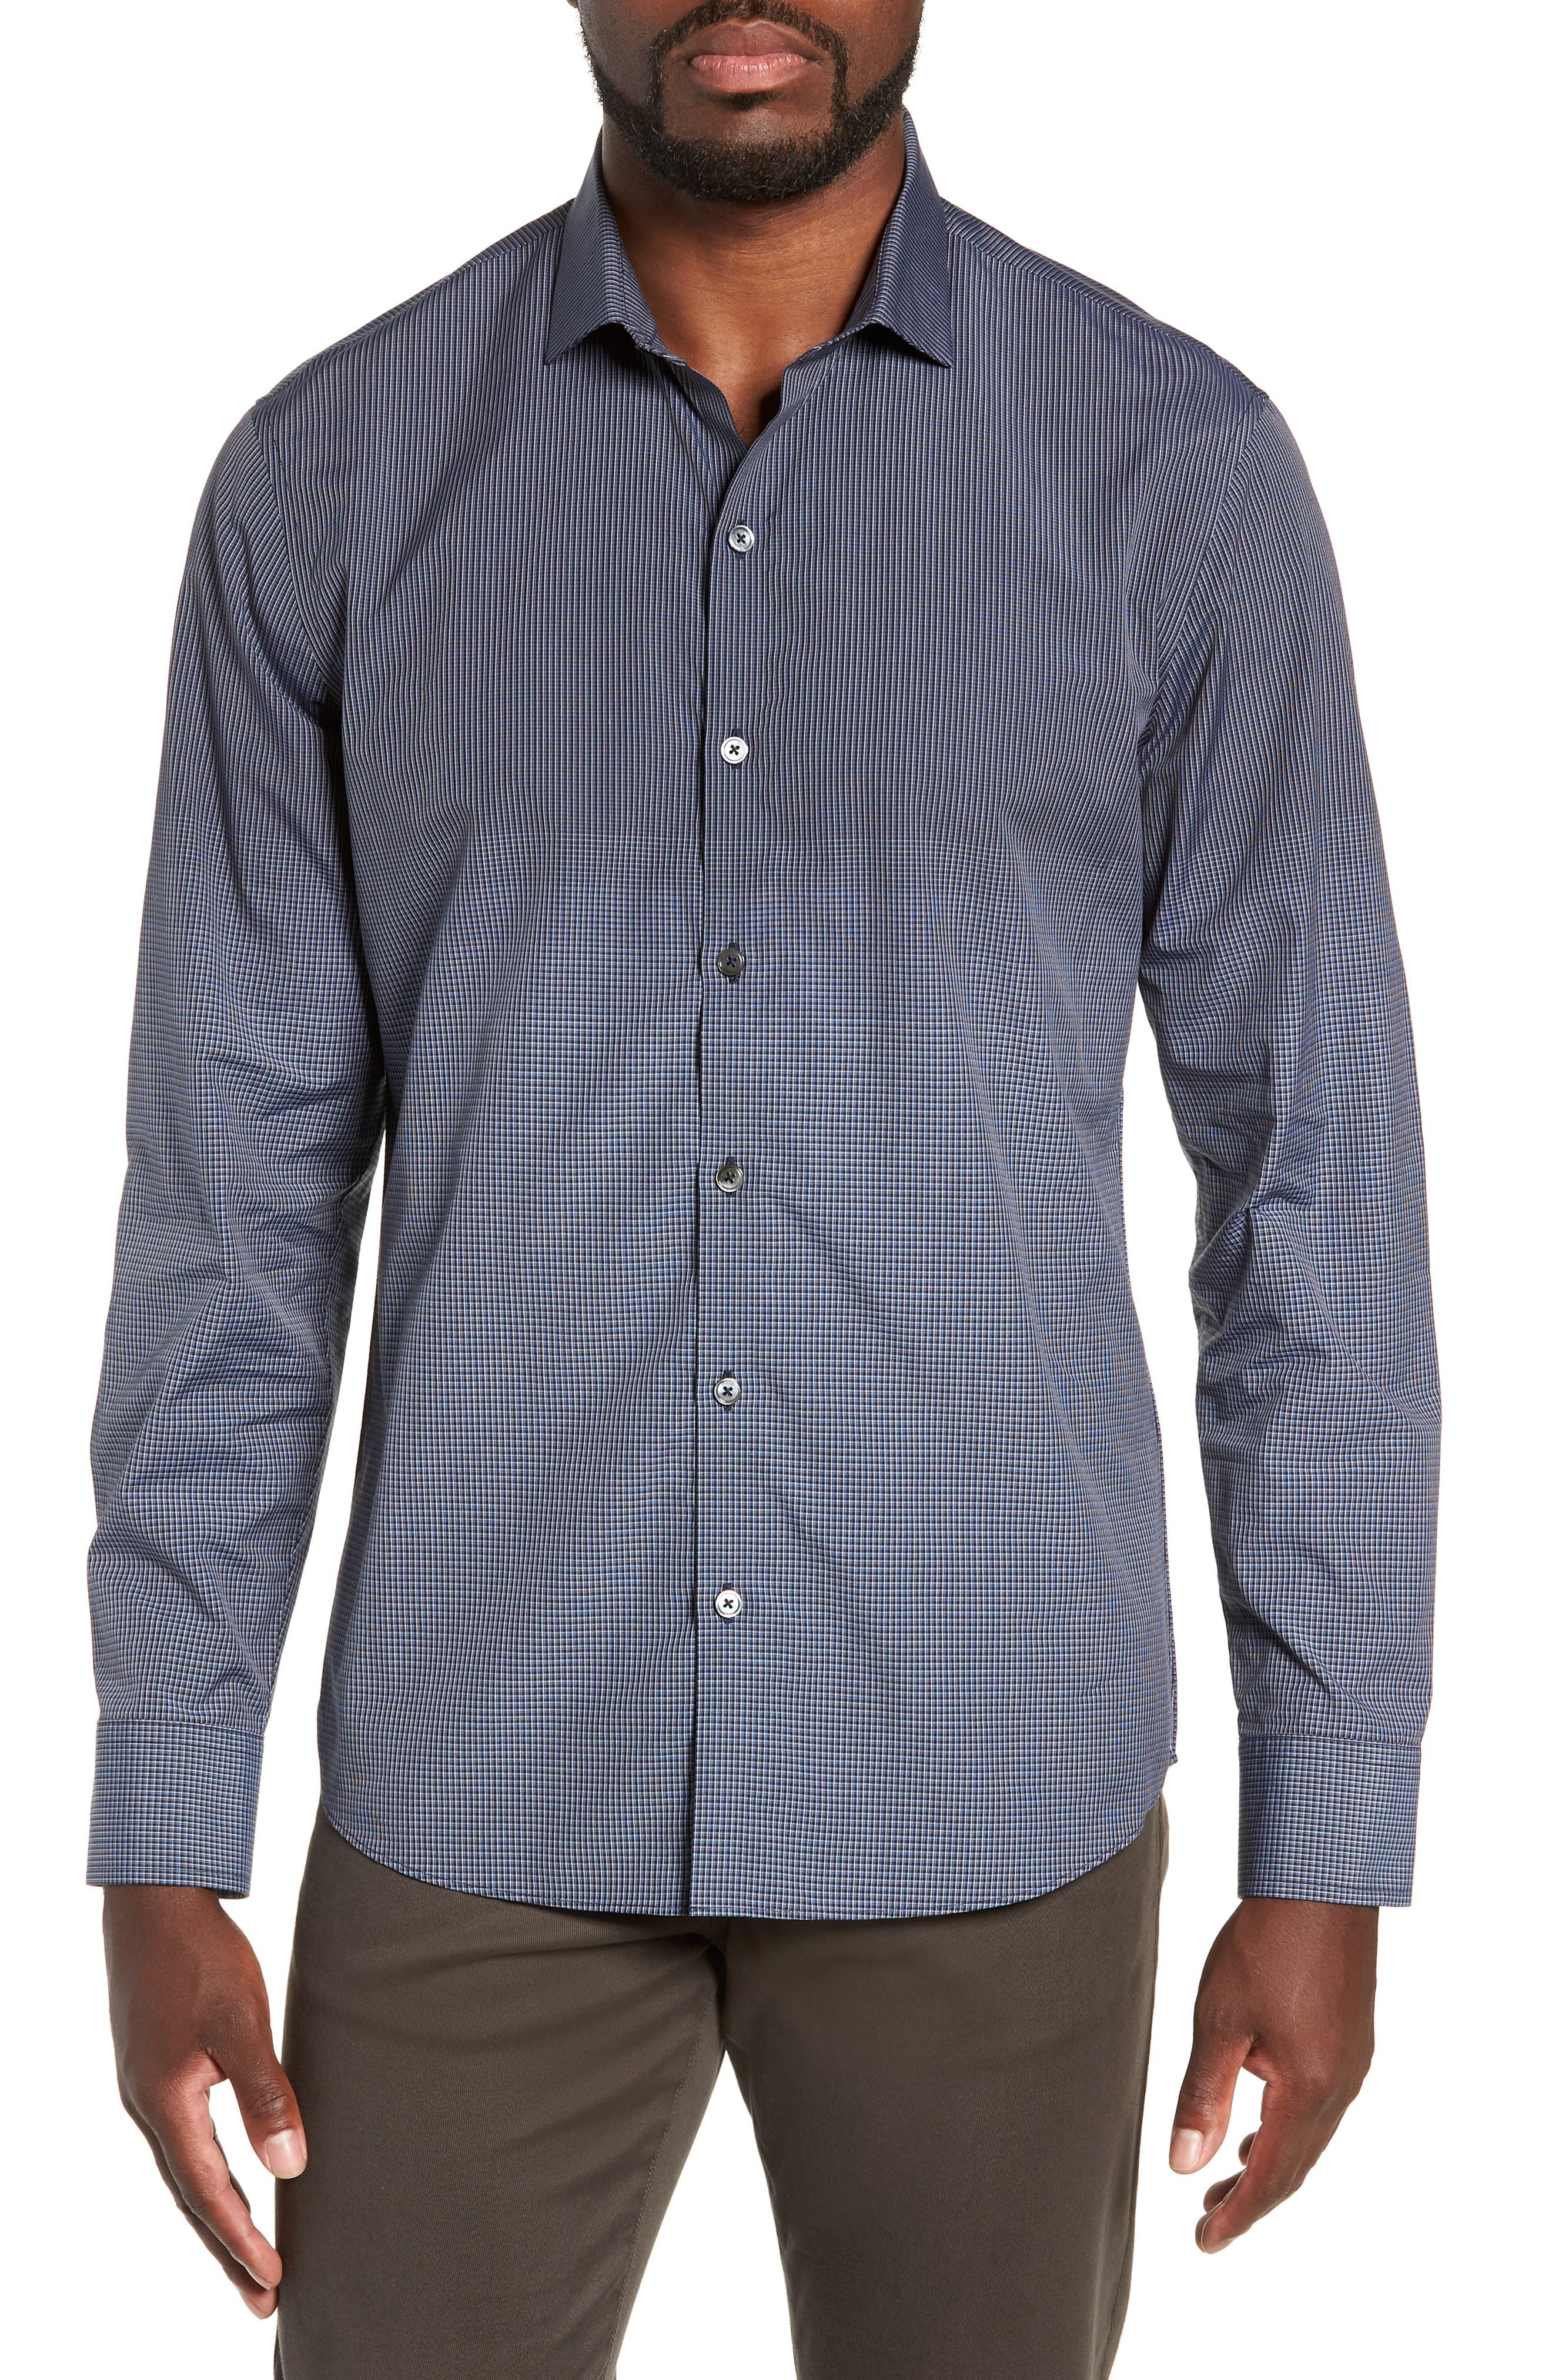 Hong Regular Fit Sport Shirt,                         Main,                         color, NAVY